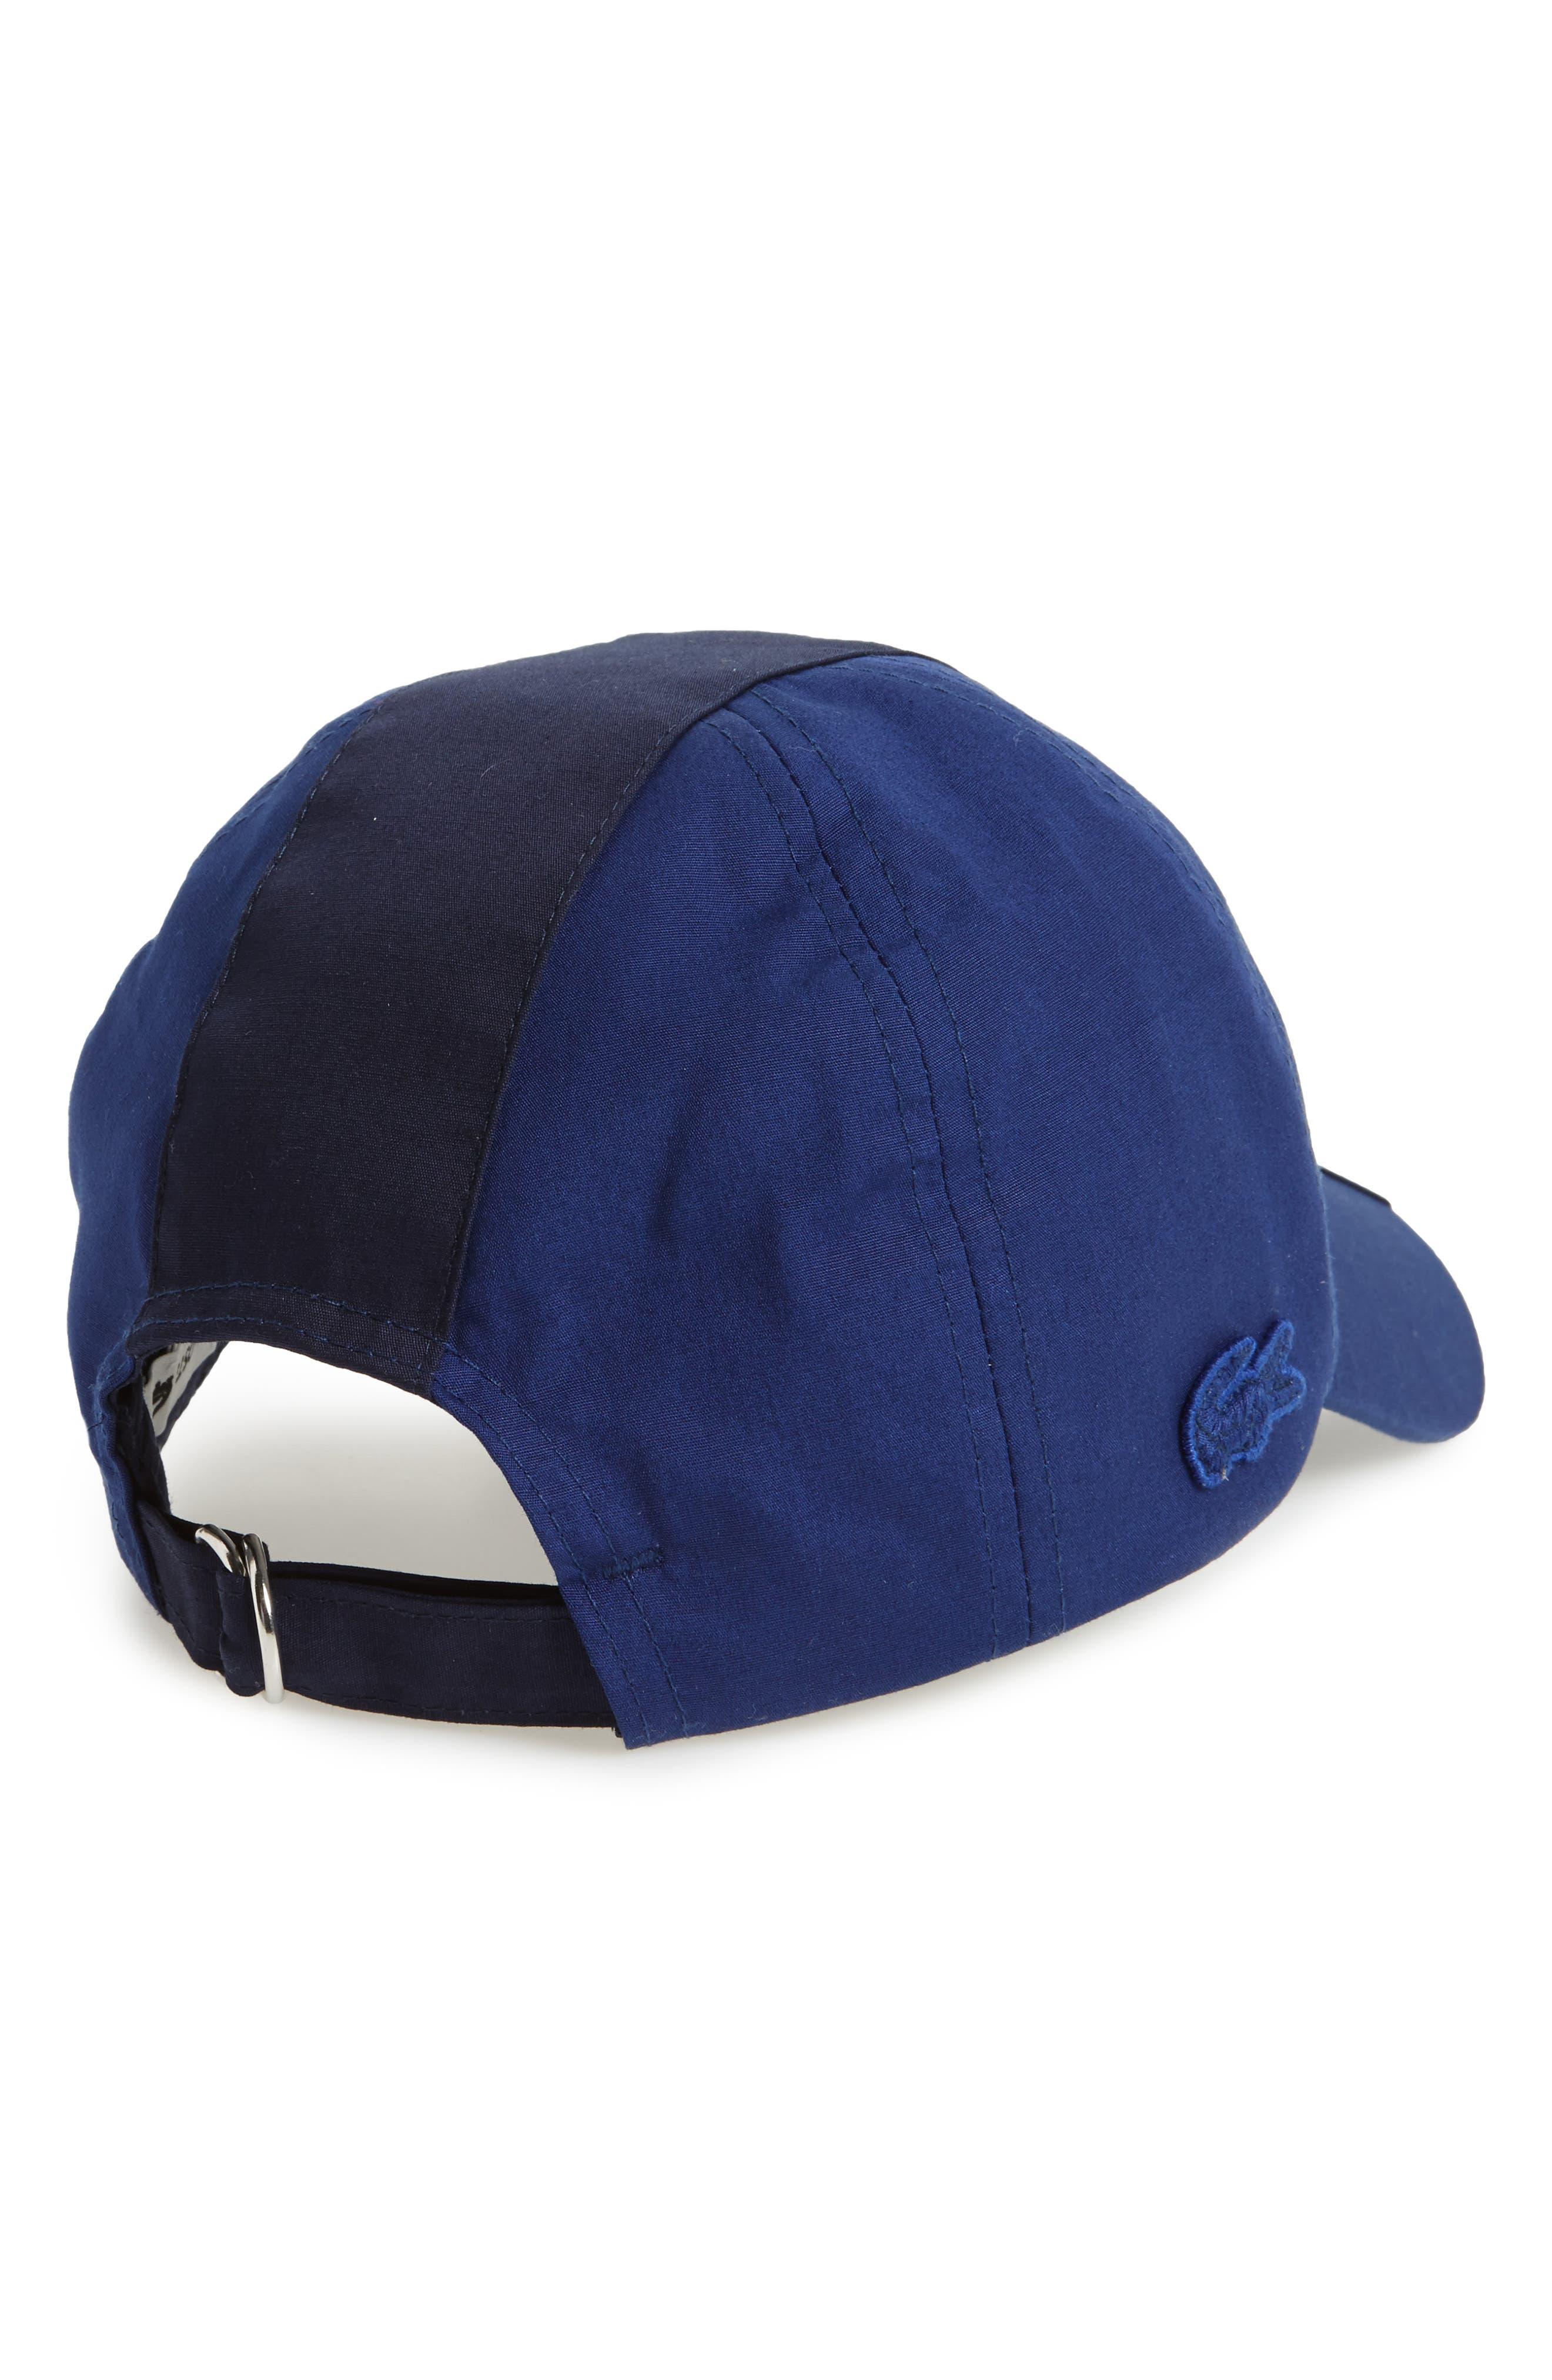 Colorblock Baseball Cap,                             Alternate thumbnail 2, color,                             Methylene/ Navy Blue